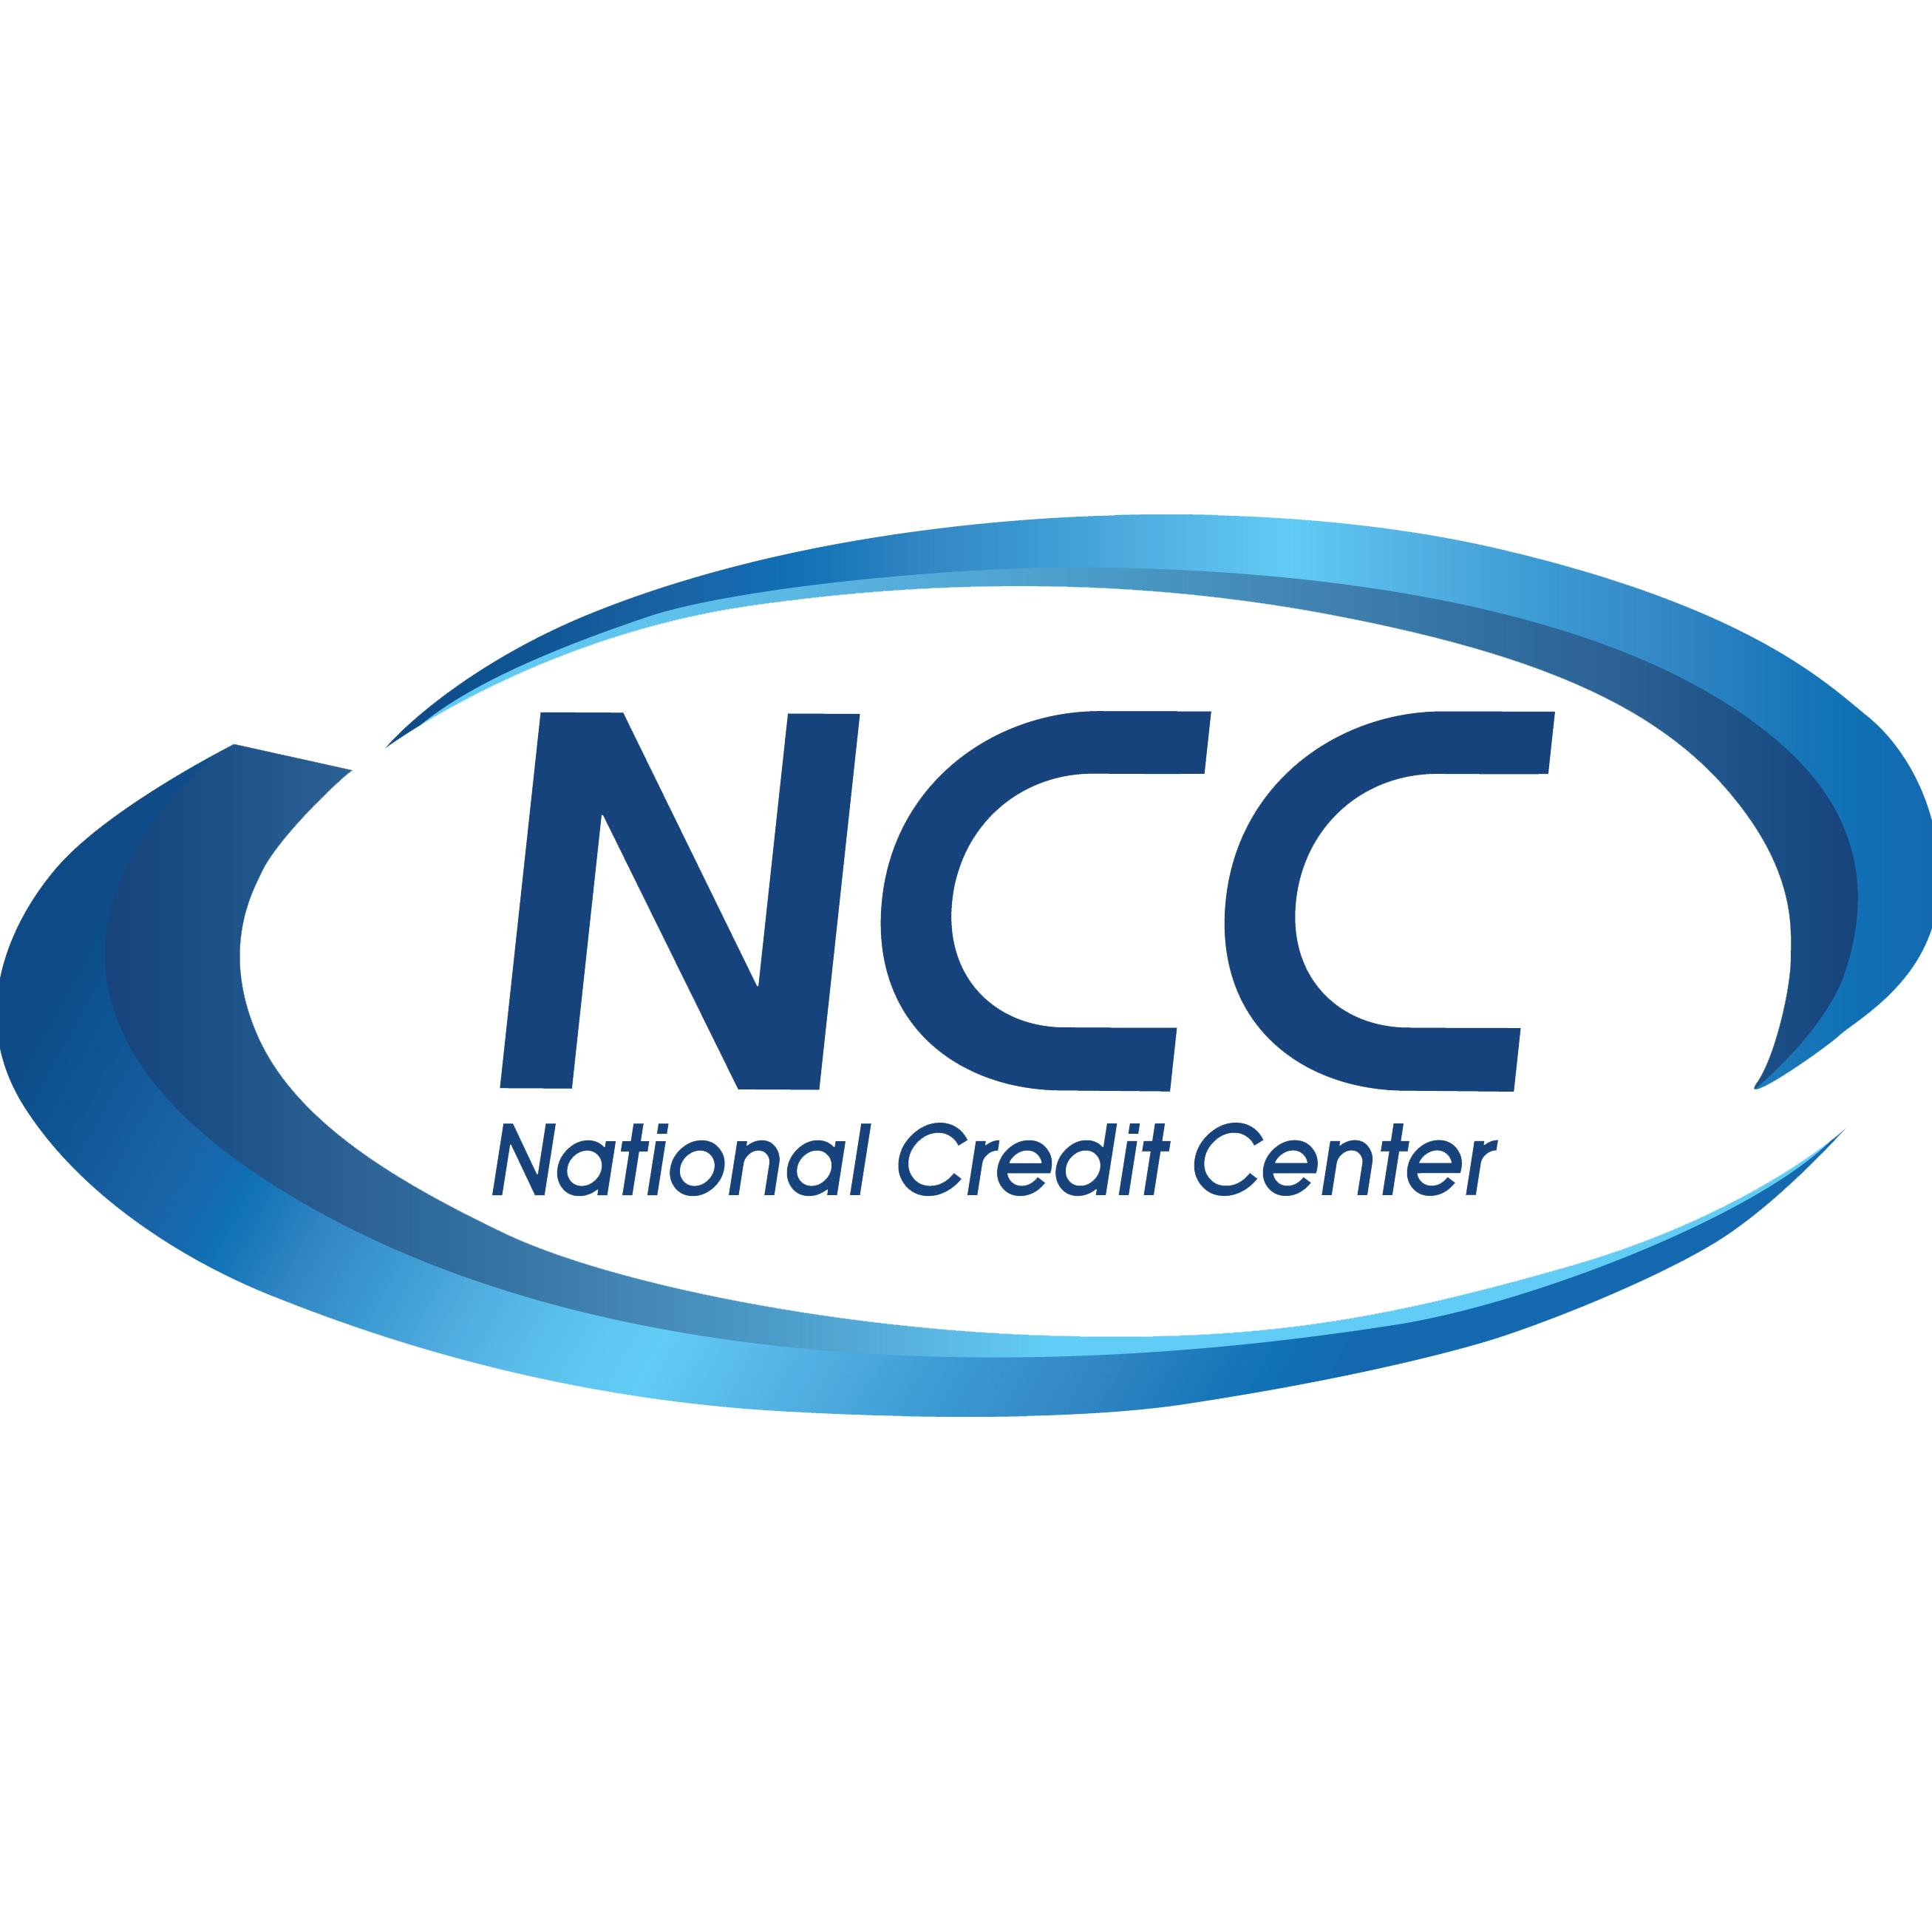 National Credit Center